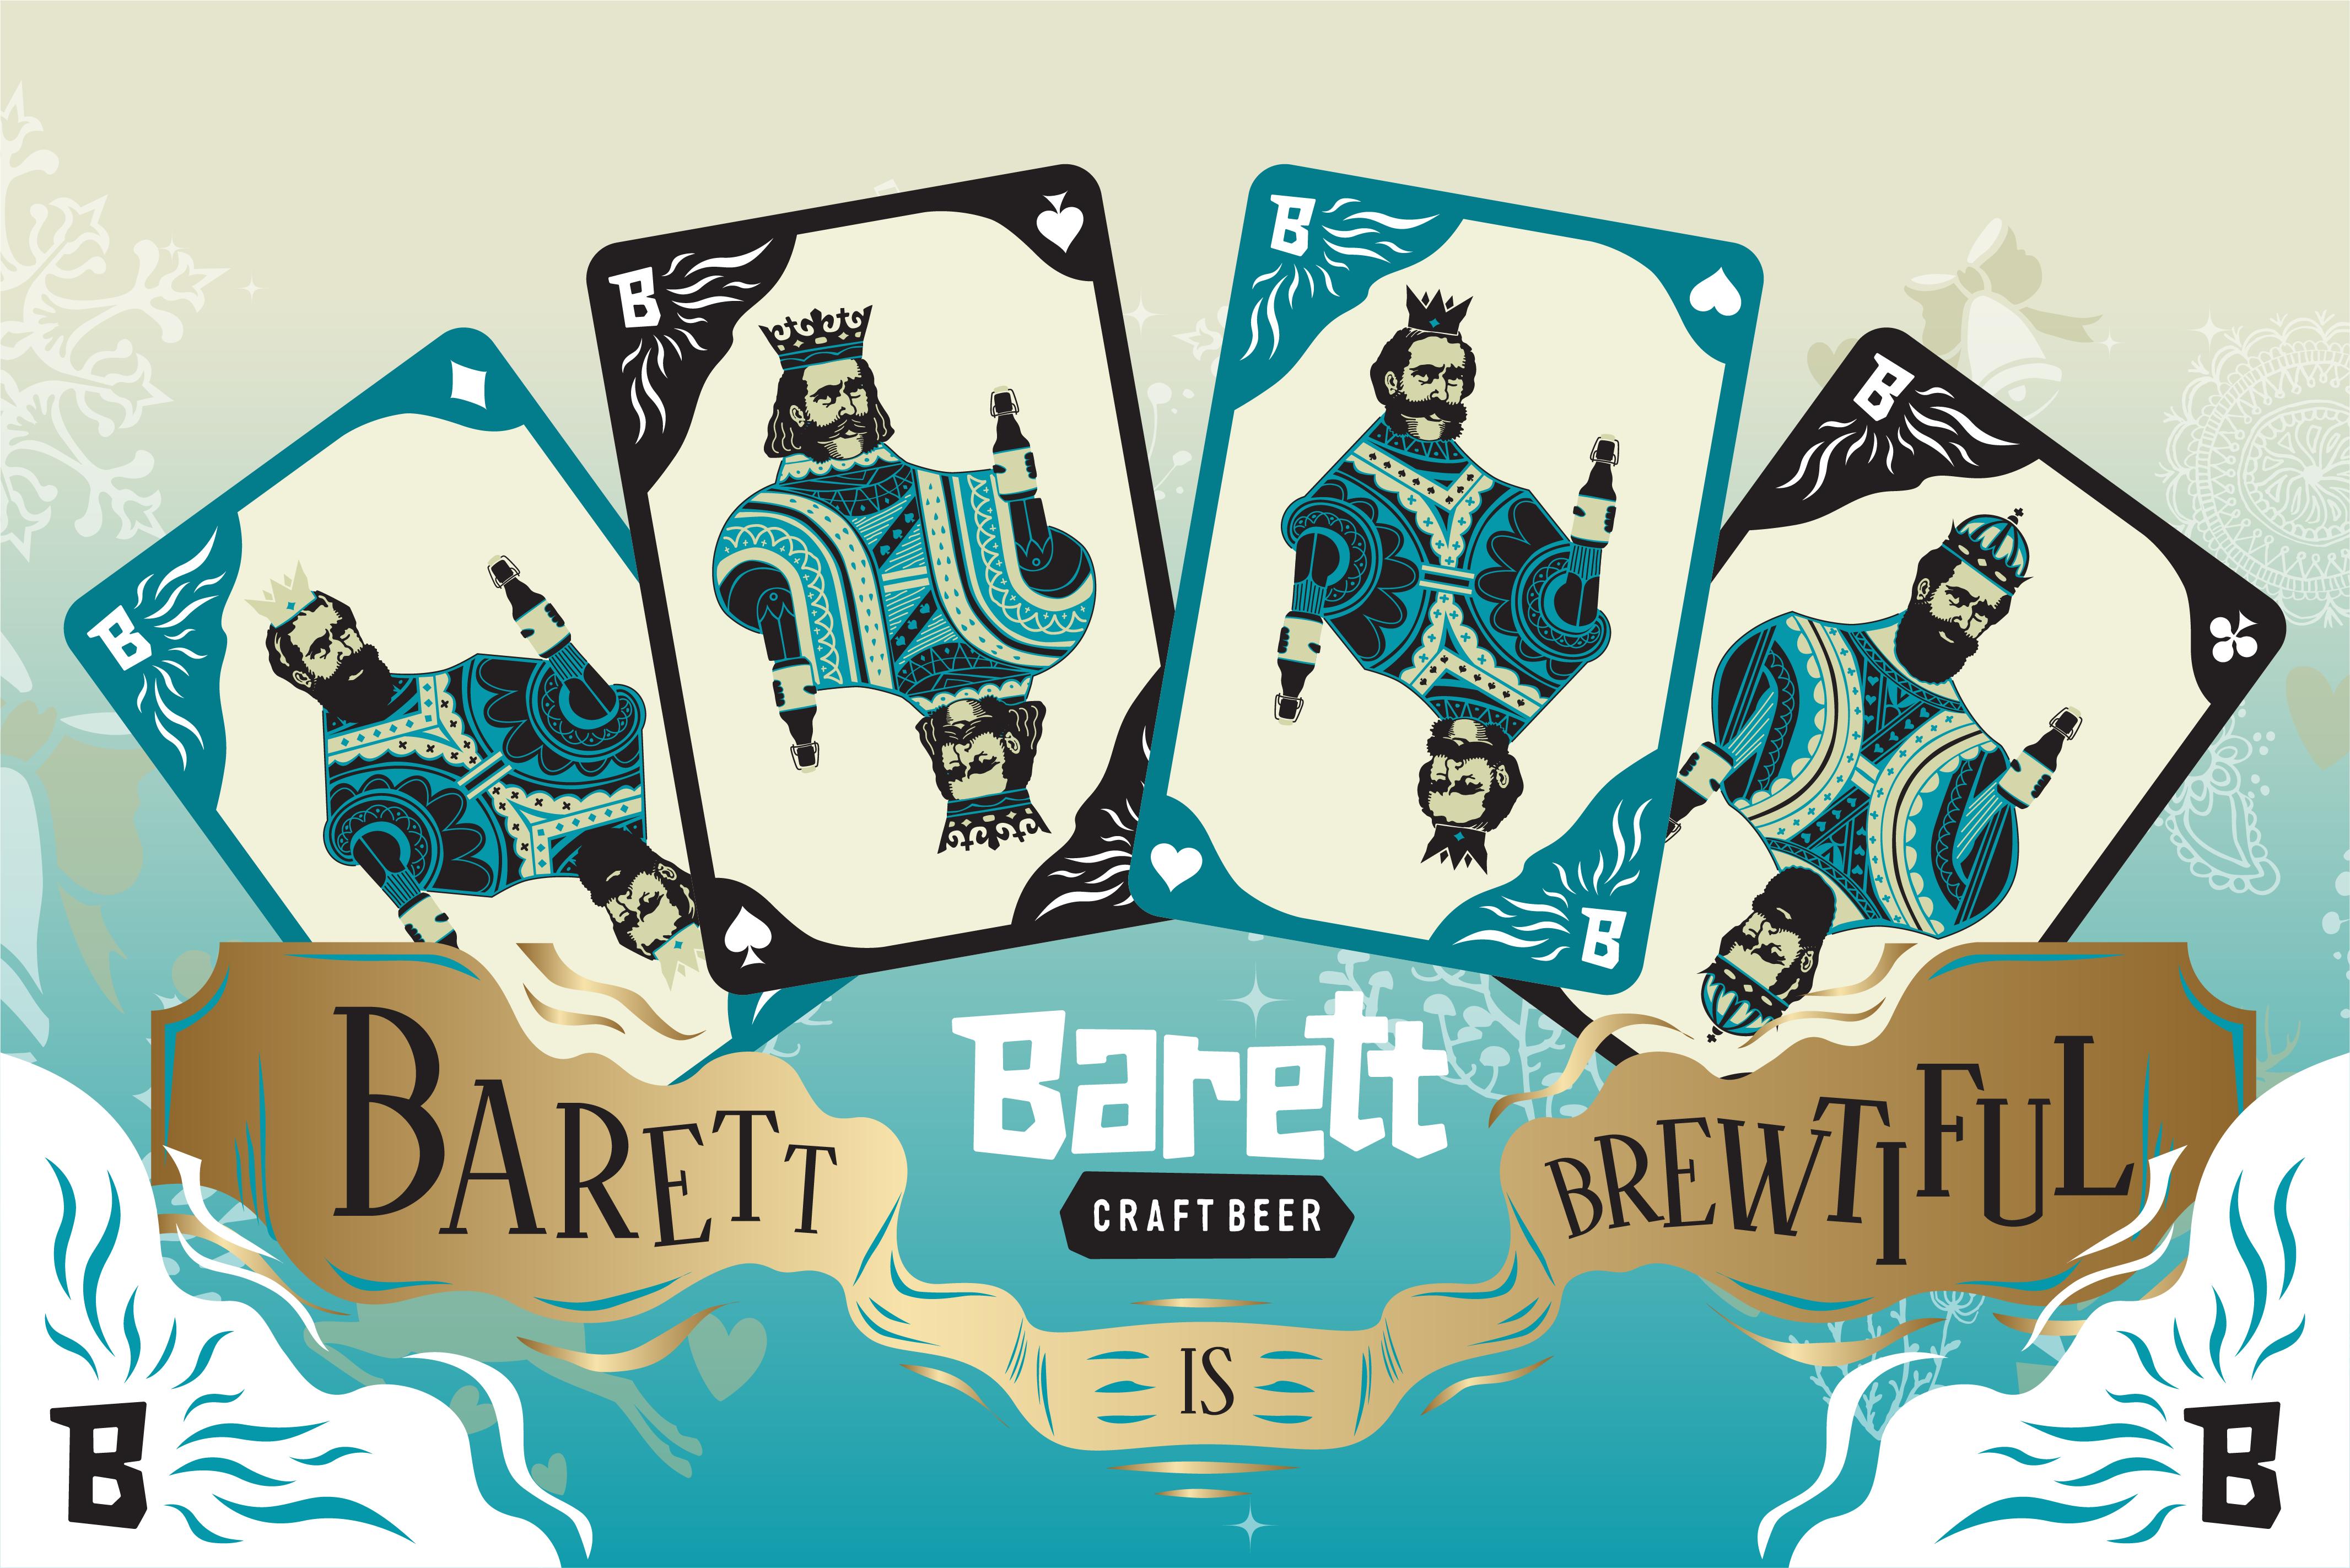 Barett_2